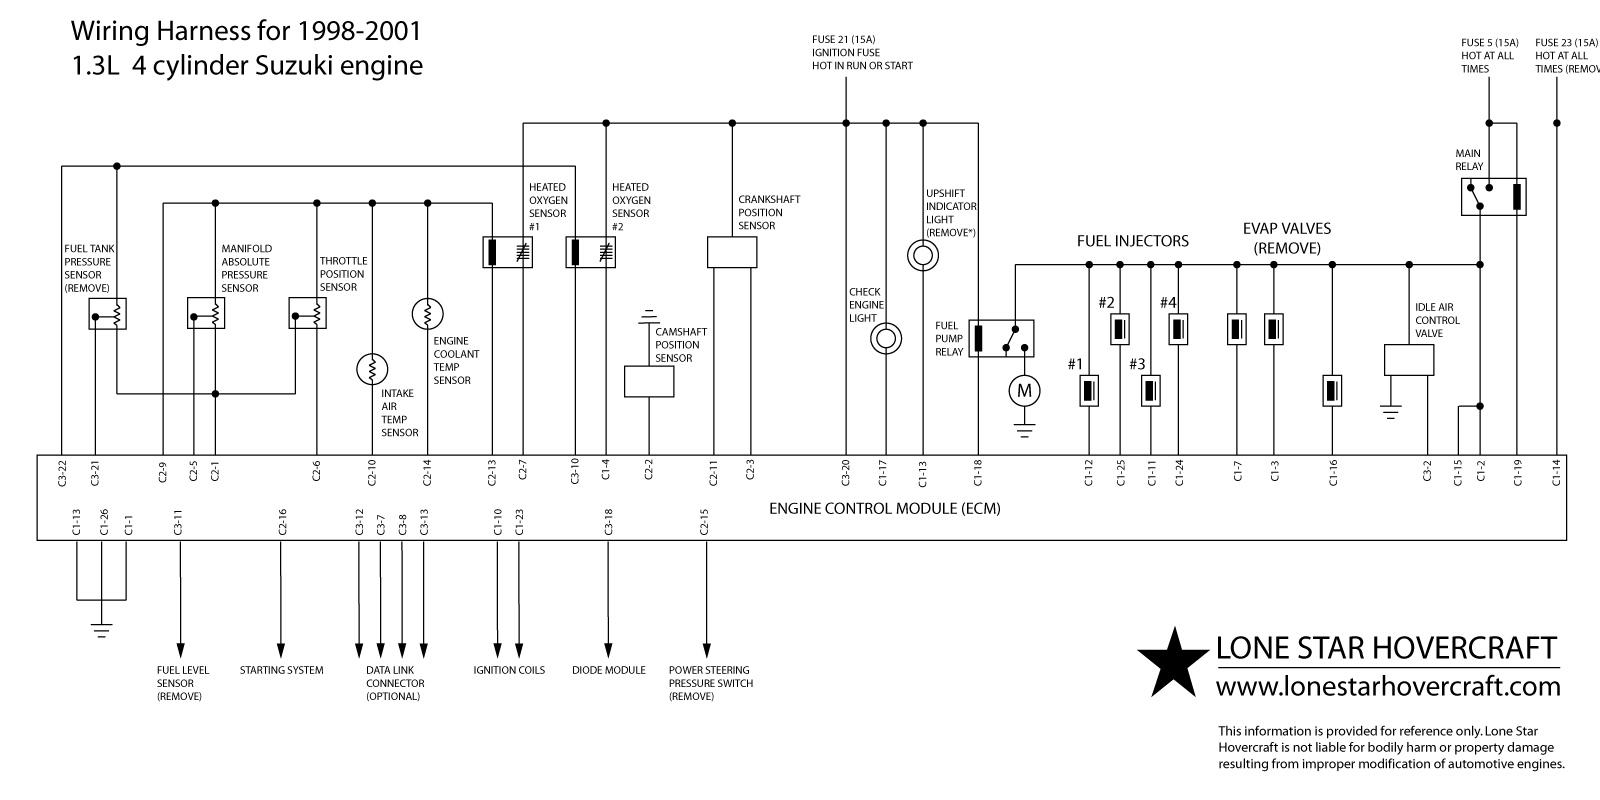 1989 suzuki sidekick wiring diagrams eg 8992  tracker fuse box diagram likewise suzuki sidekick fuse  tracker fuse box diagram likewise